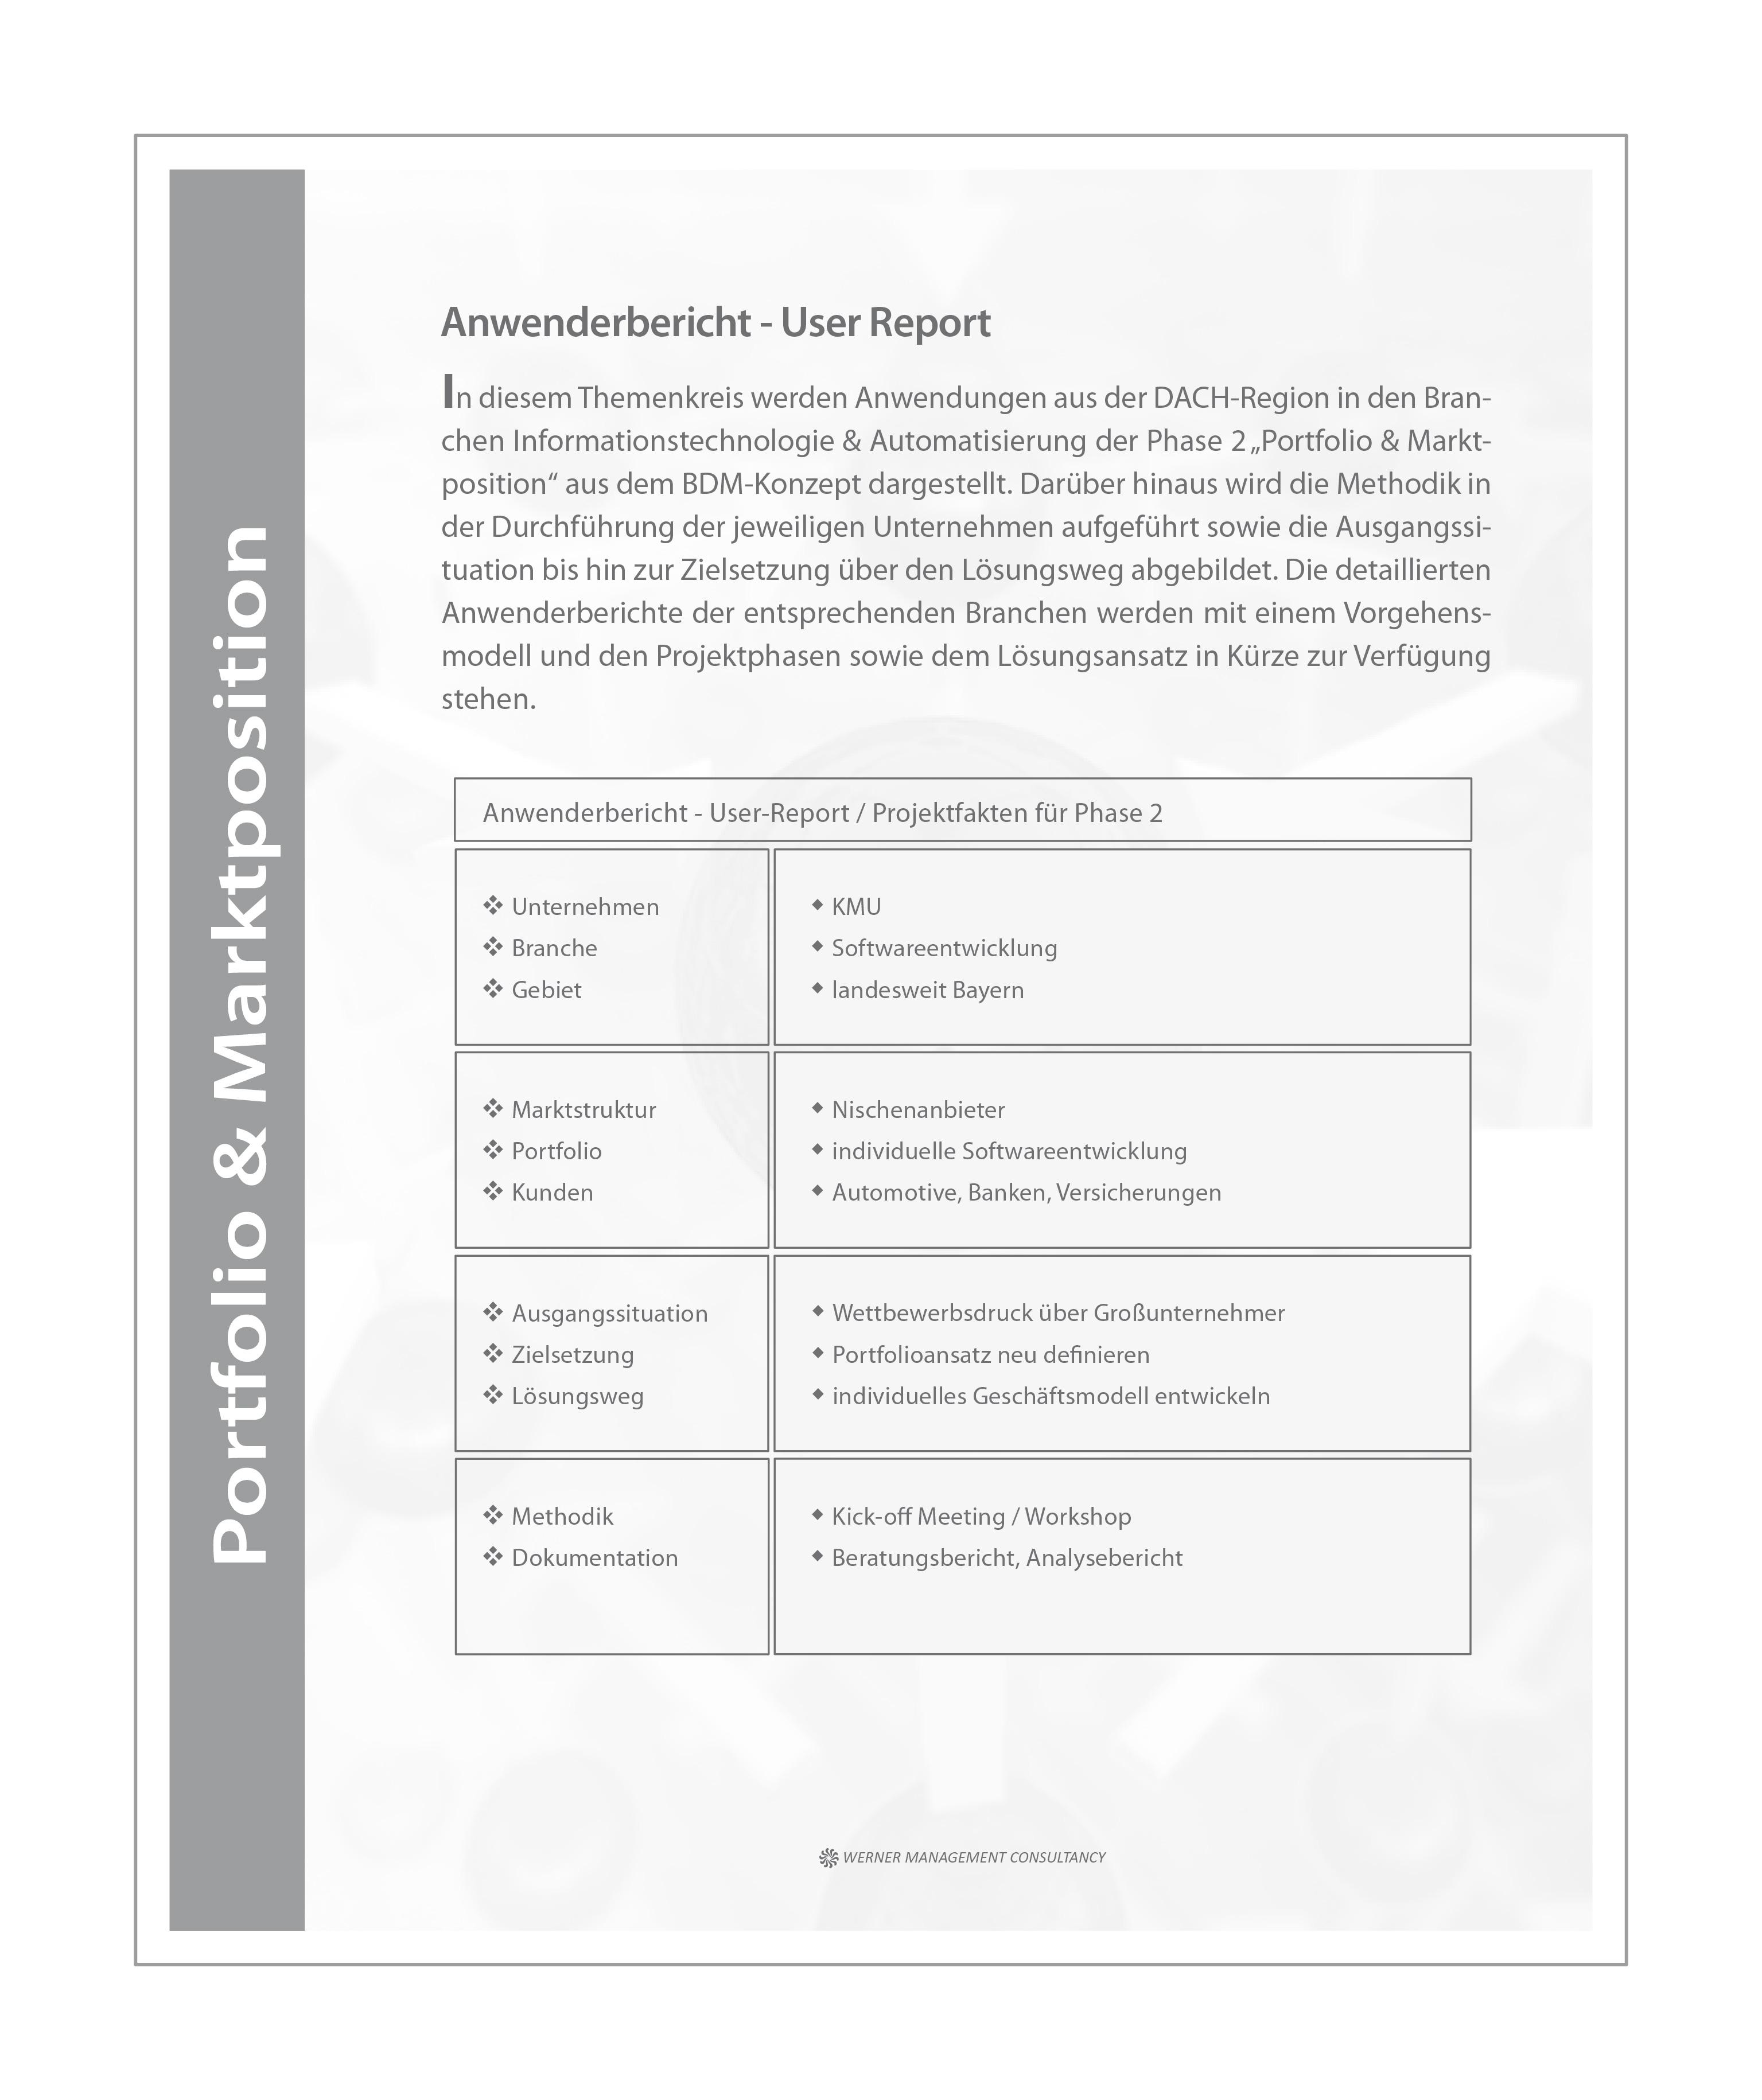 WMC Broschüre Business Development Phase-2 Anwenderbericht